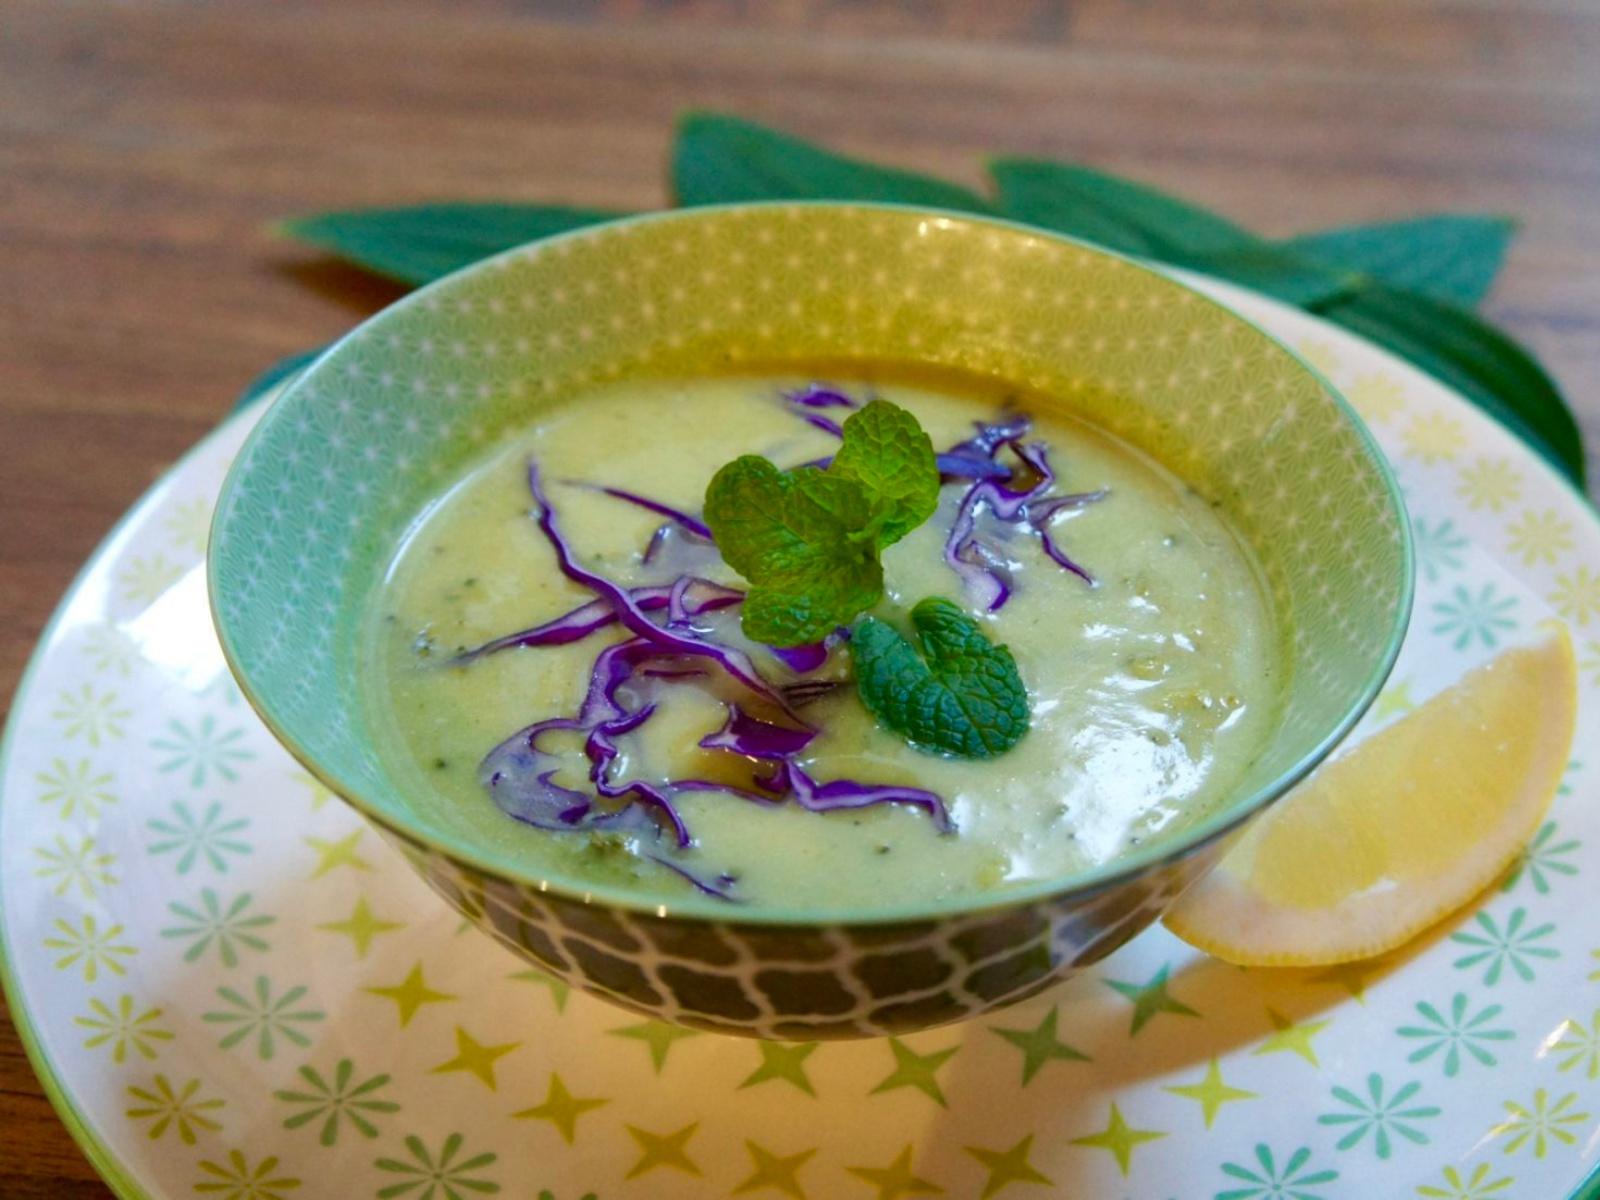 Vegan Zucchini and Broccoli Soup